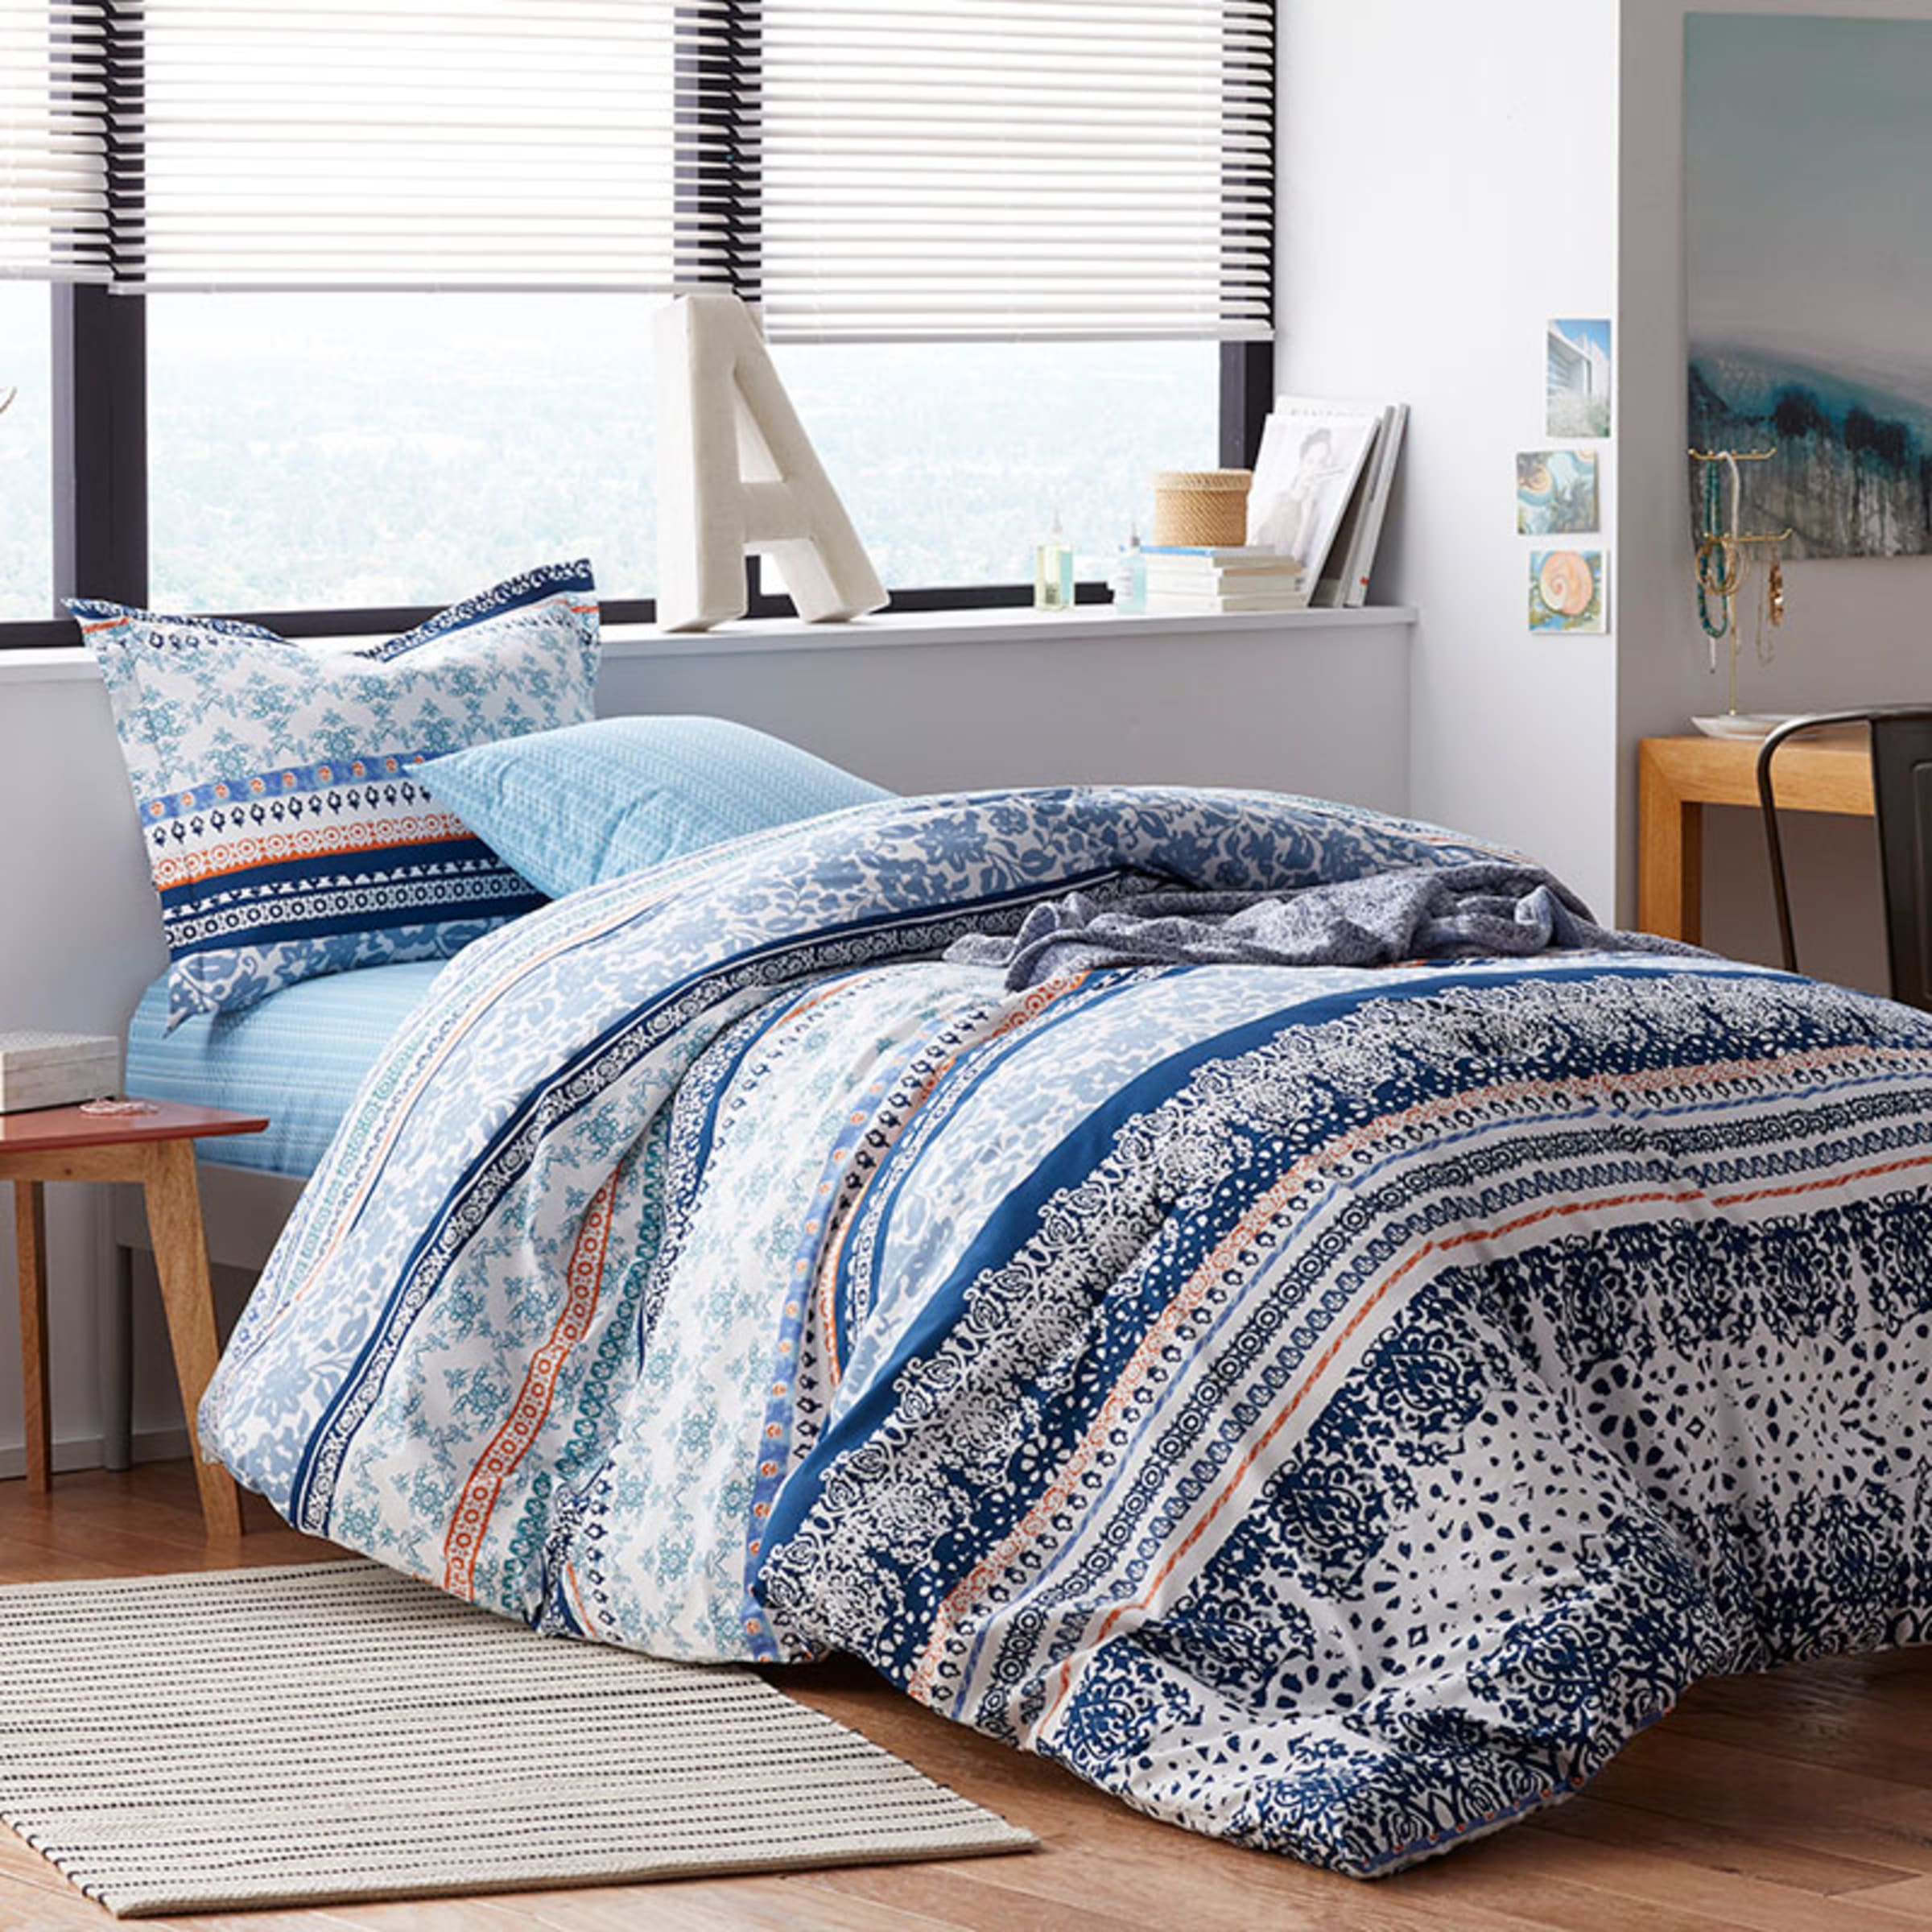 Rylie Cotton Percale Twin Xl Dorm Comforter